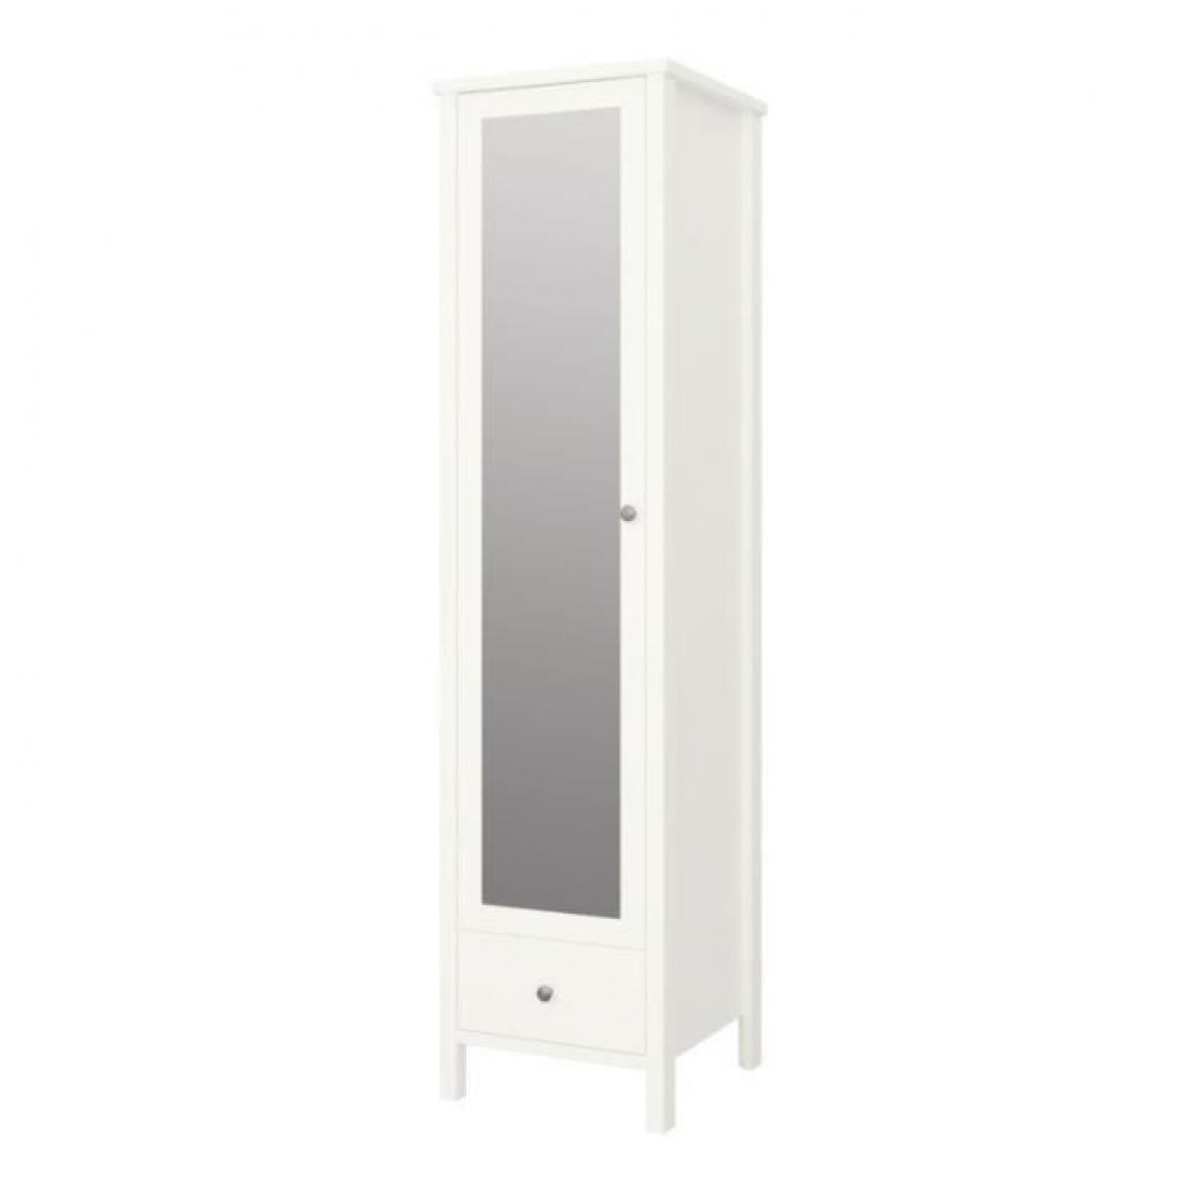 Cstore TROMSÖ Armoire 1 porte miroir + 1 tiroir - Laqué blanc MDF